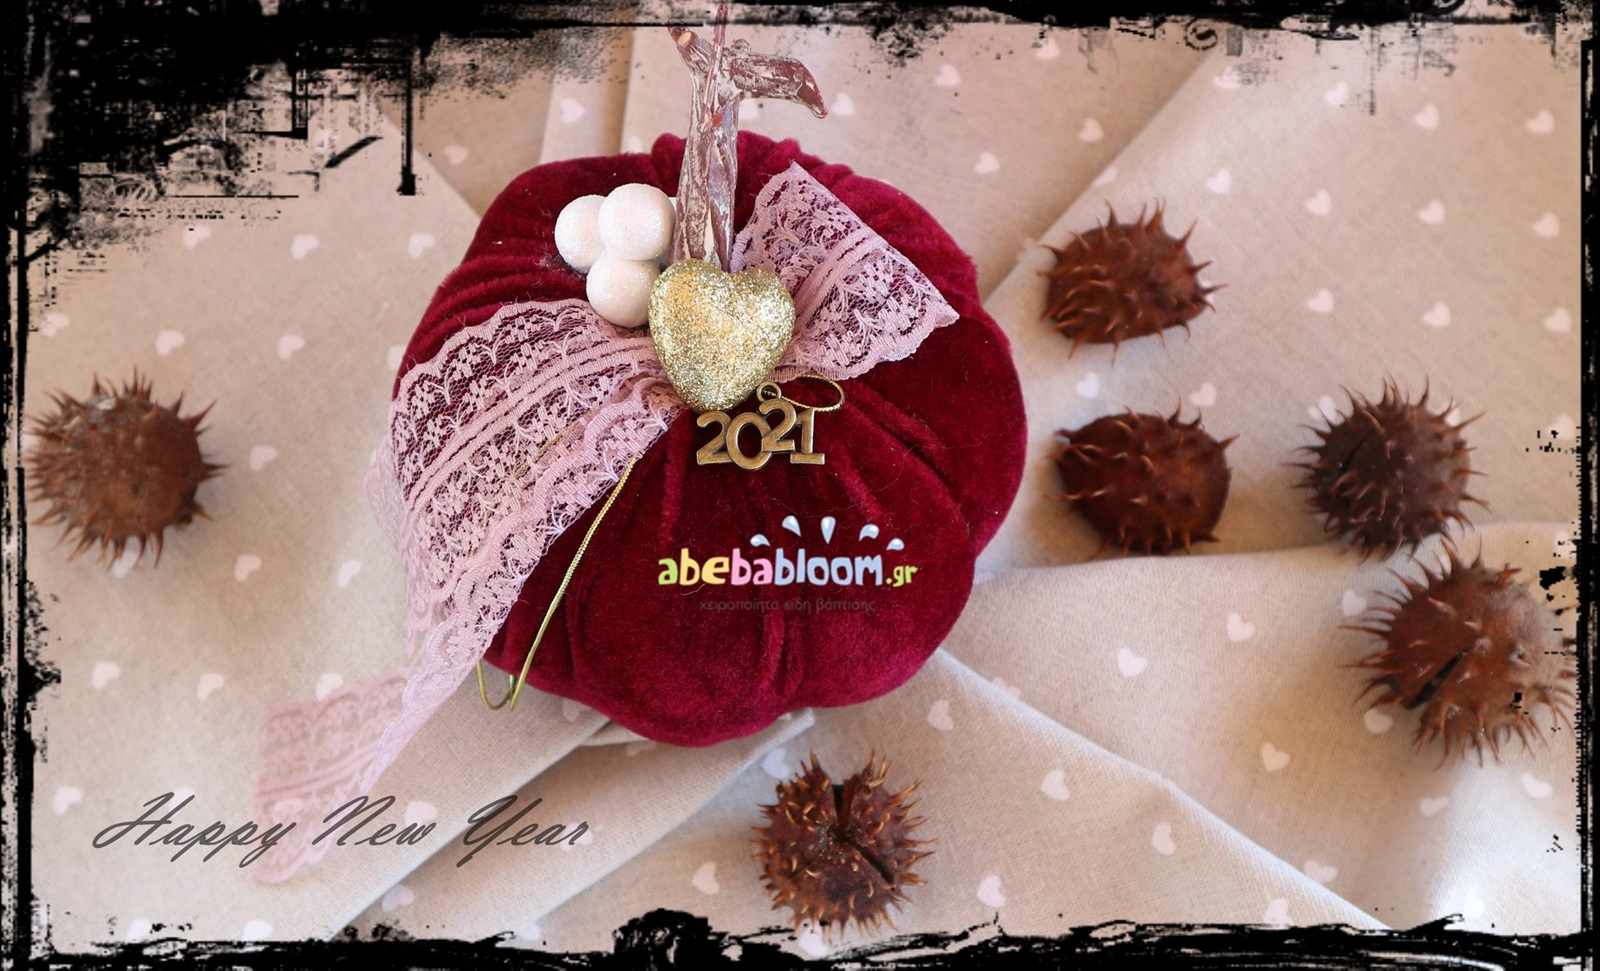 1_abebabloom